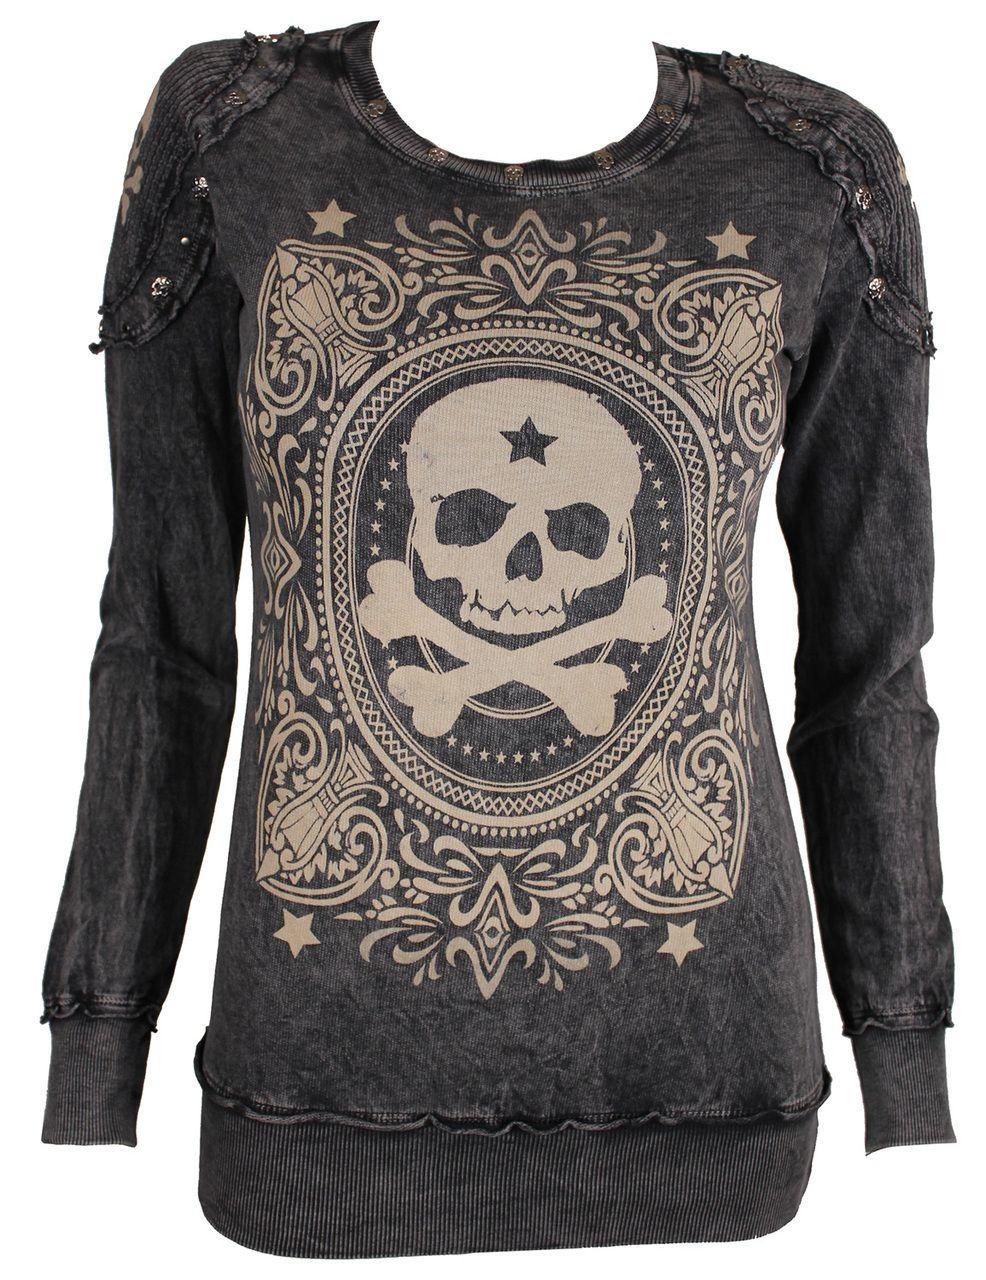 Best 25 tattoo sleeve shirt ideas on pinterest alice in for Tattoo sleeve shirts for women